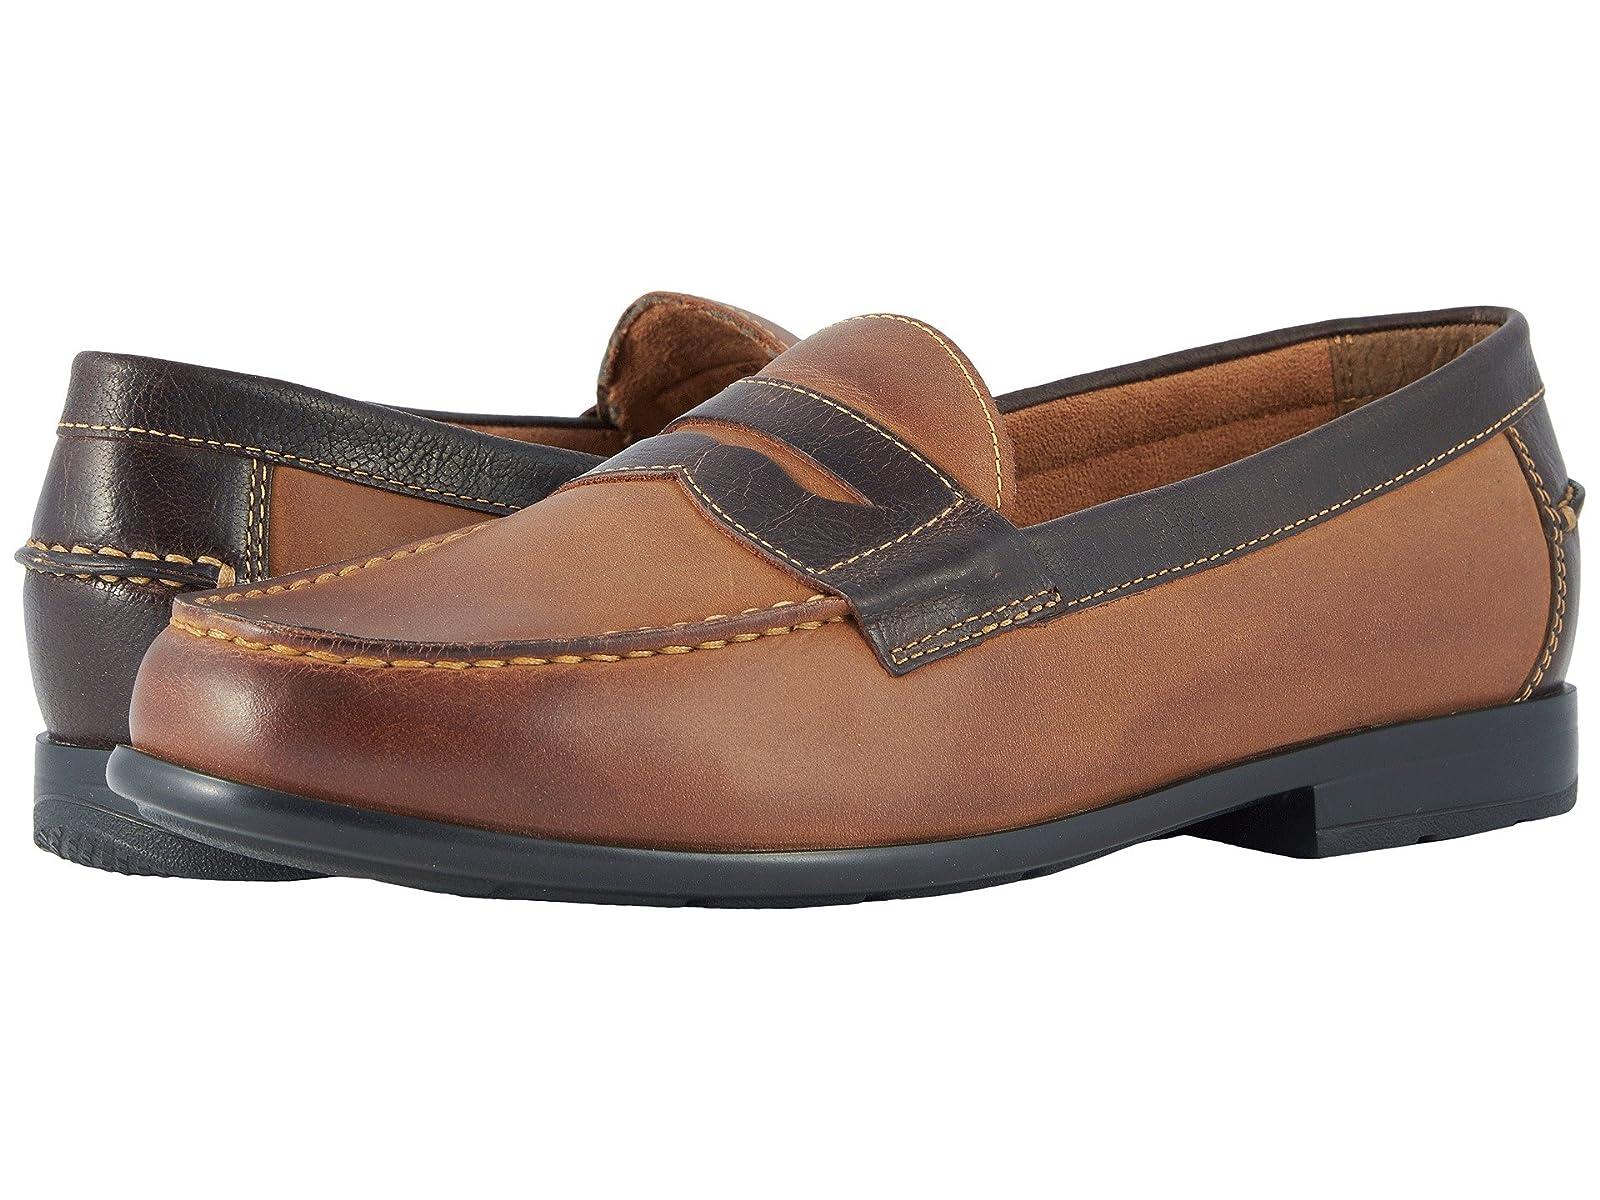 Nunn Bush Drexel Moc Toe Penny Loafer with KORE Walking Comfort TechnologyAtmospheric grades have affordable shoes